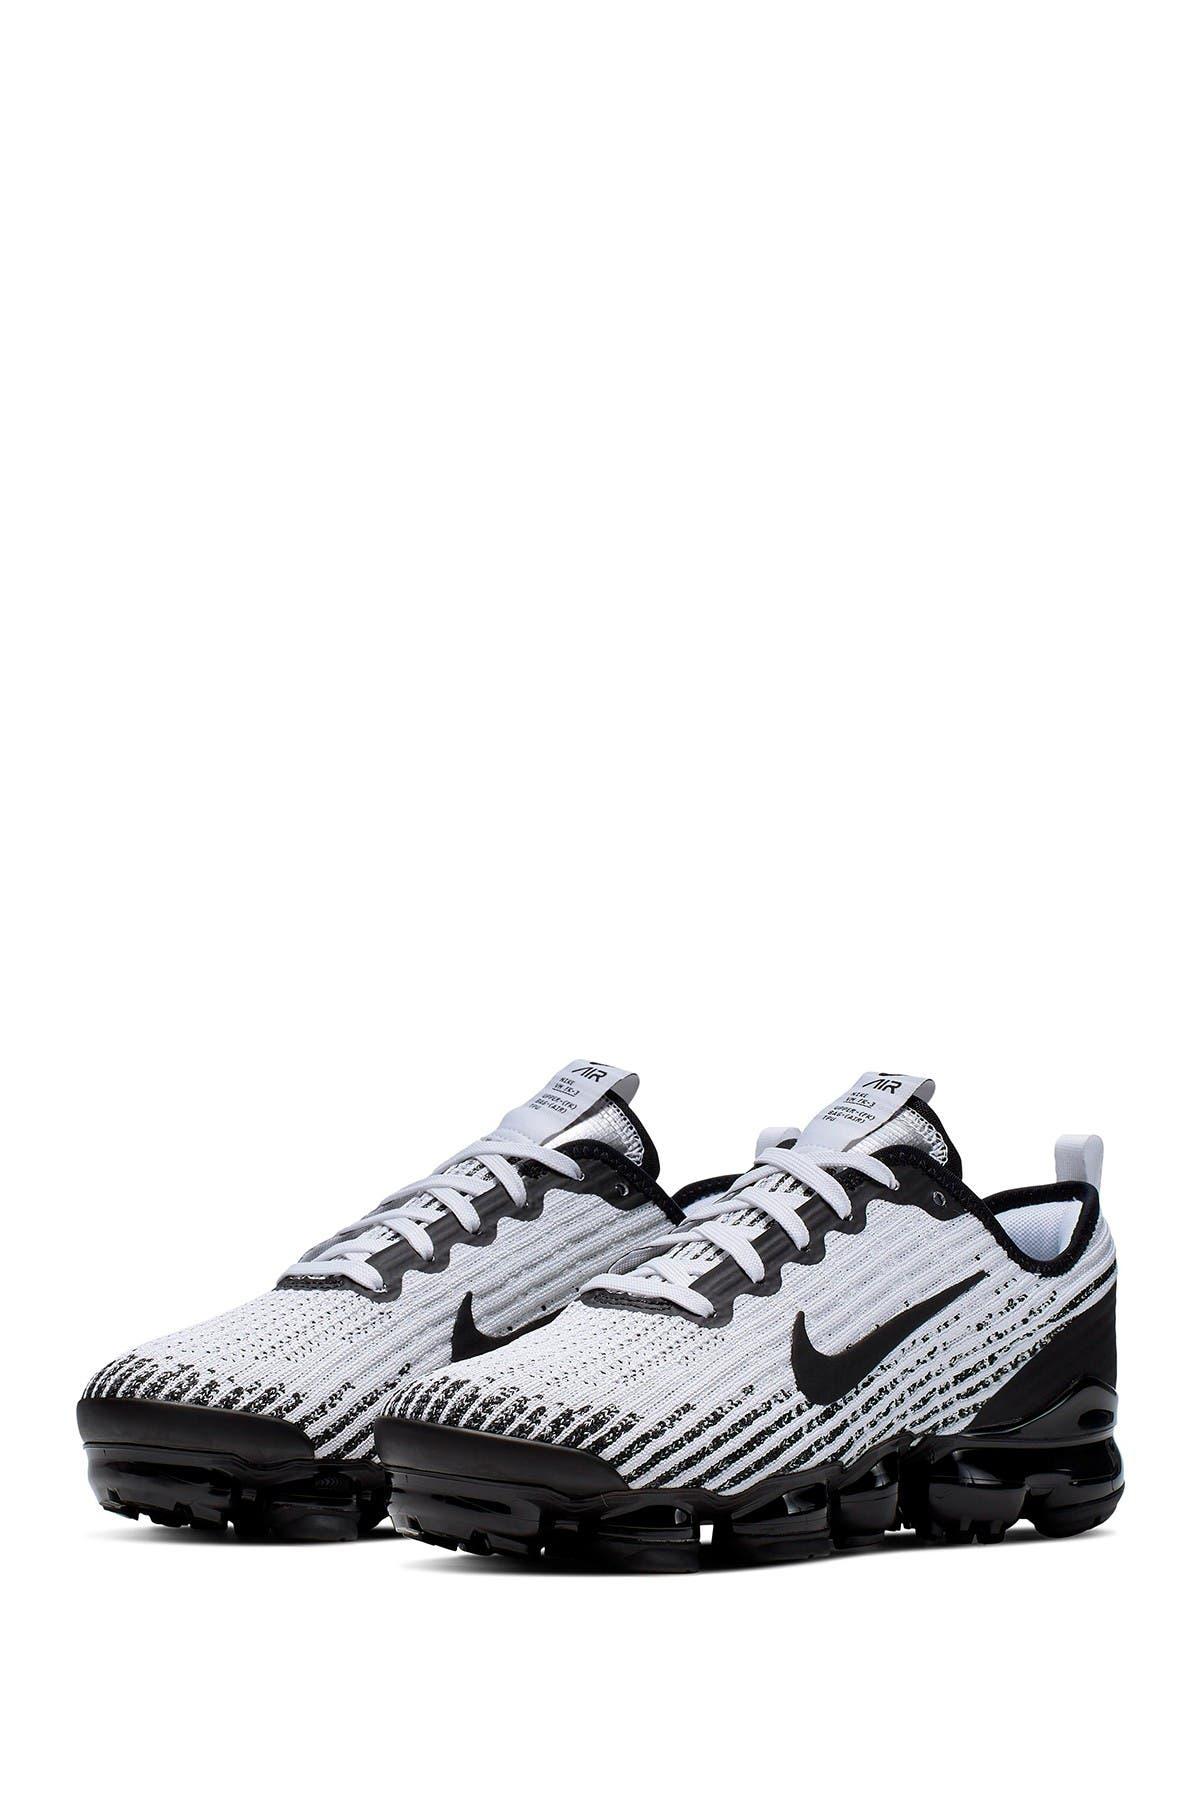 Nike | Air Vapormax Flyknit Sneaker